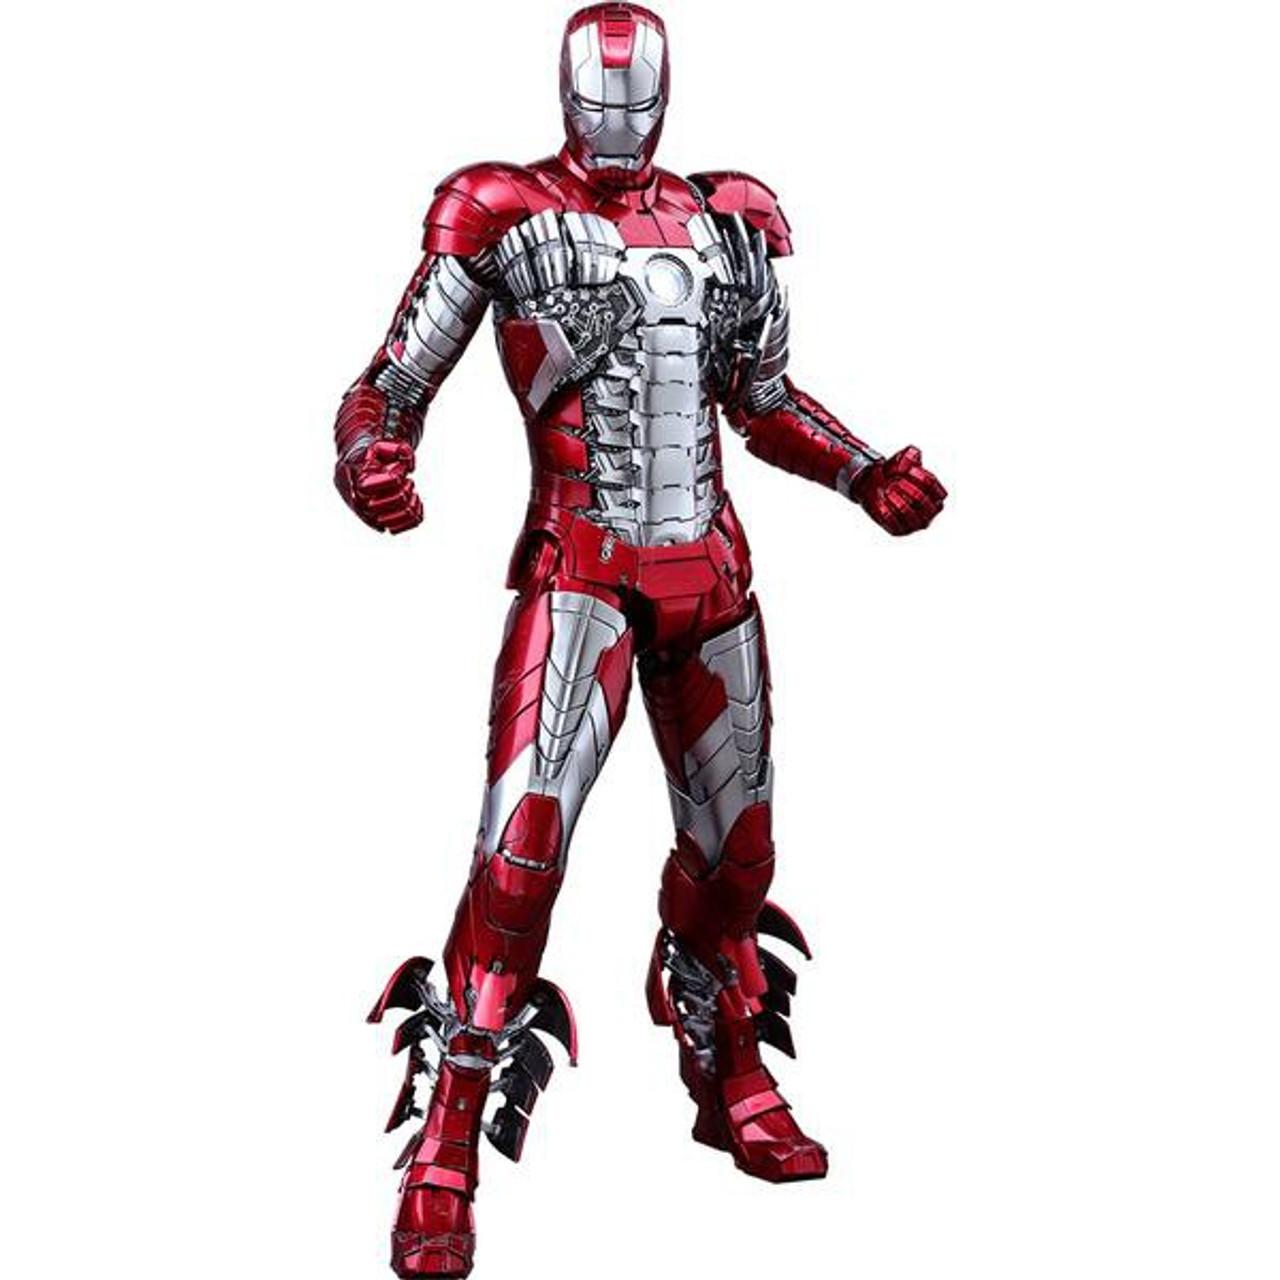 Marvel Iron Man 2 Movie Masterpiece Diecast Iron Man Mark V Collectible Figure (Pre-Order ships April)